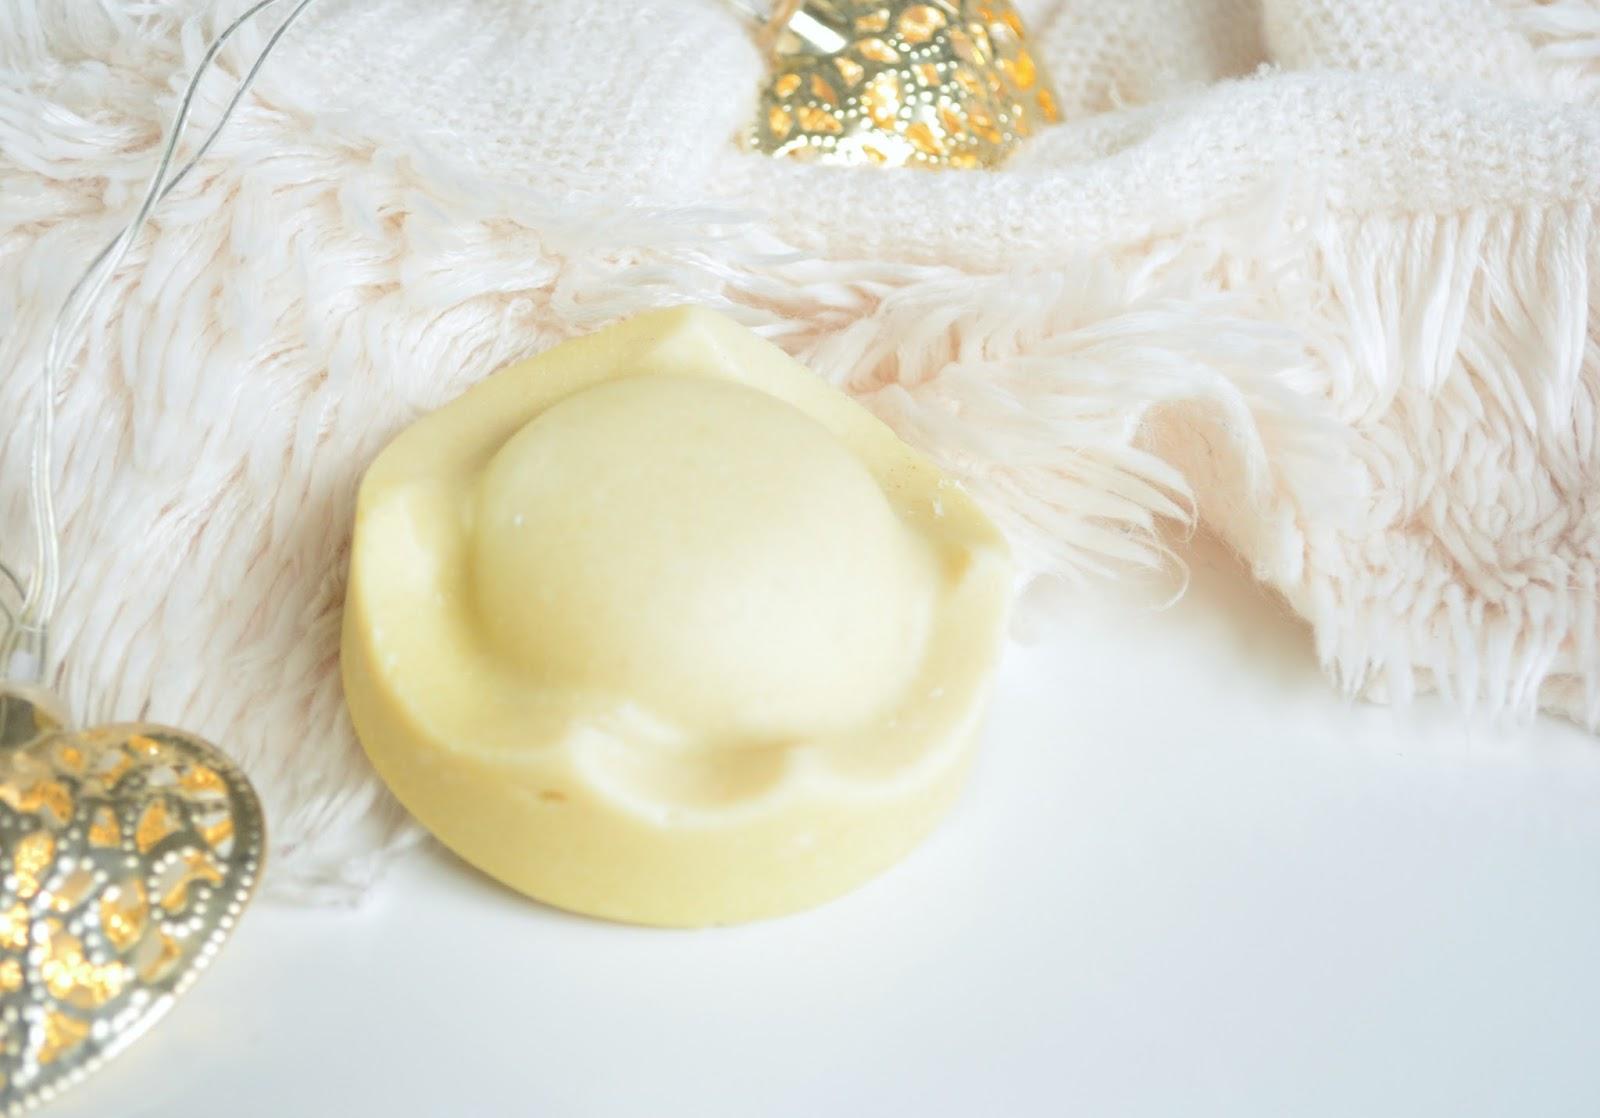 Lush, King of Skin, Lush Haul, Lush Review, Skin of Skin Review, Tanya Burr, Moisturiser, Beauty, Skincare